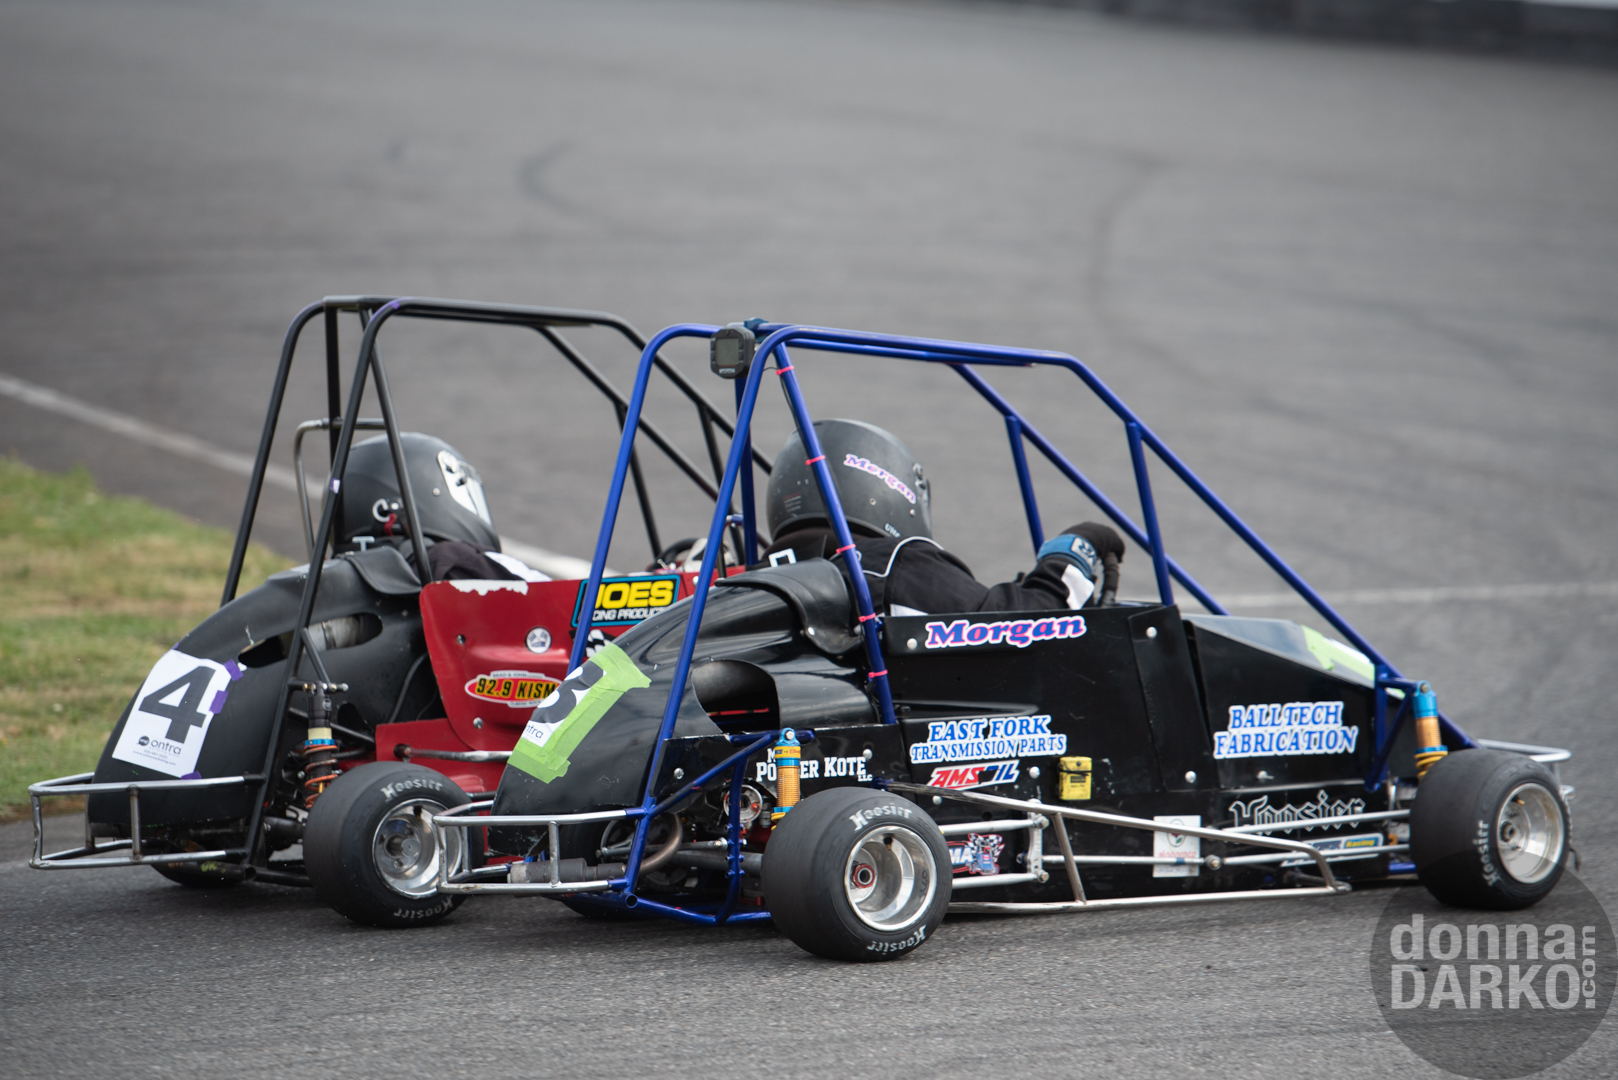 QWMA (Racing) 8-11-2019 DSC_7728.jpg